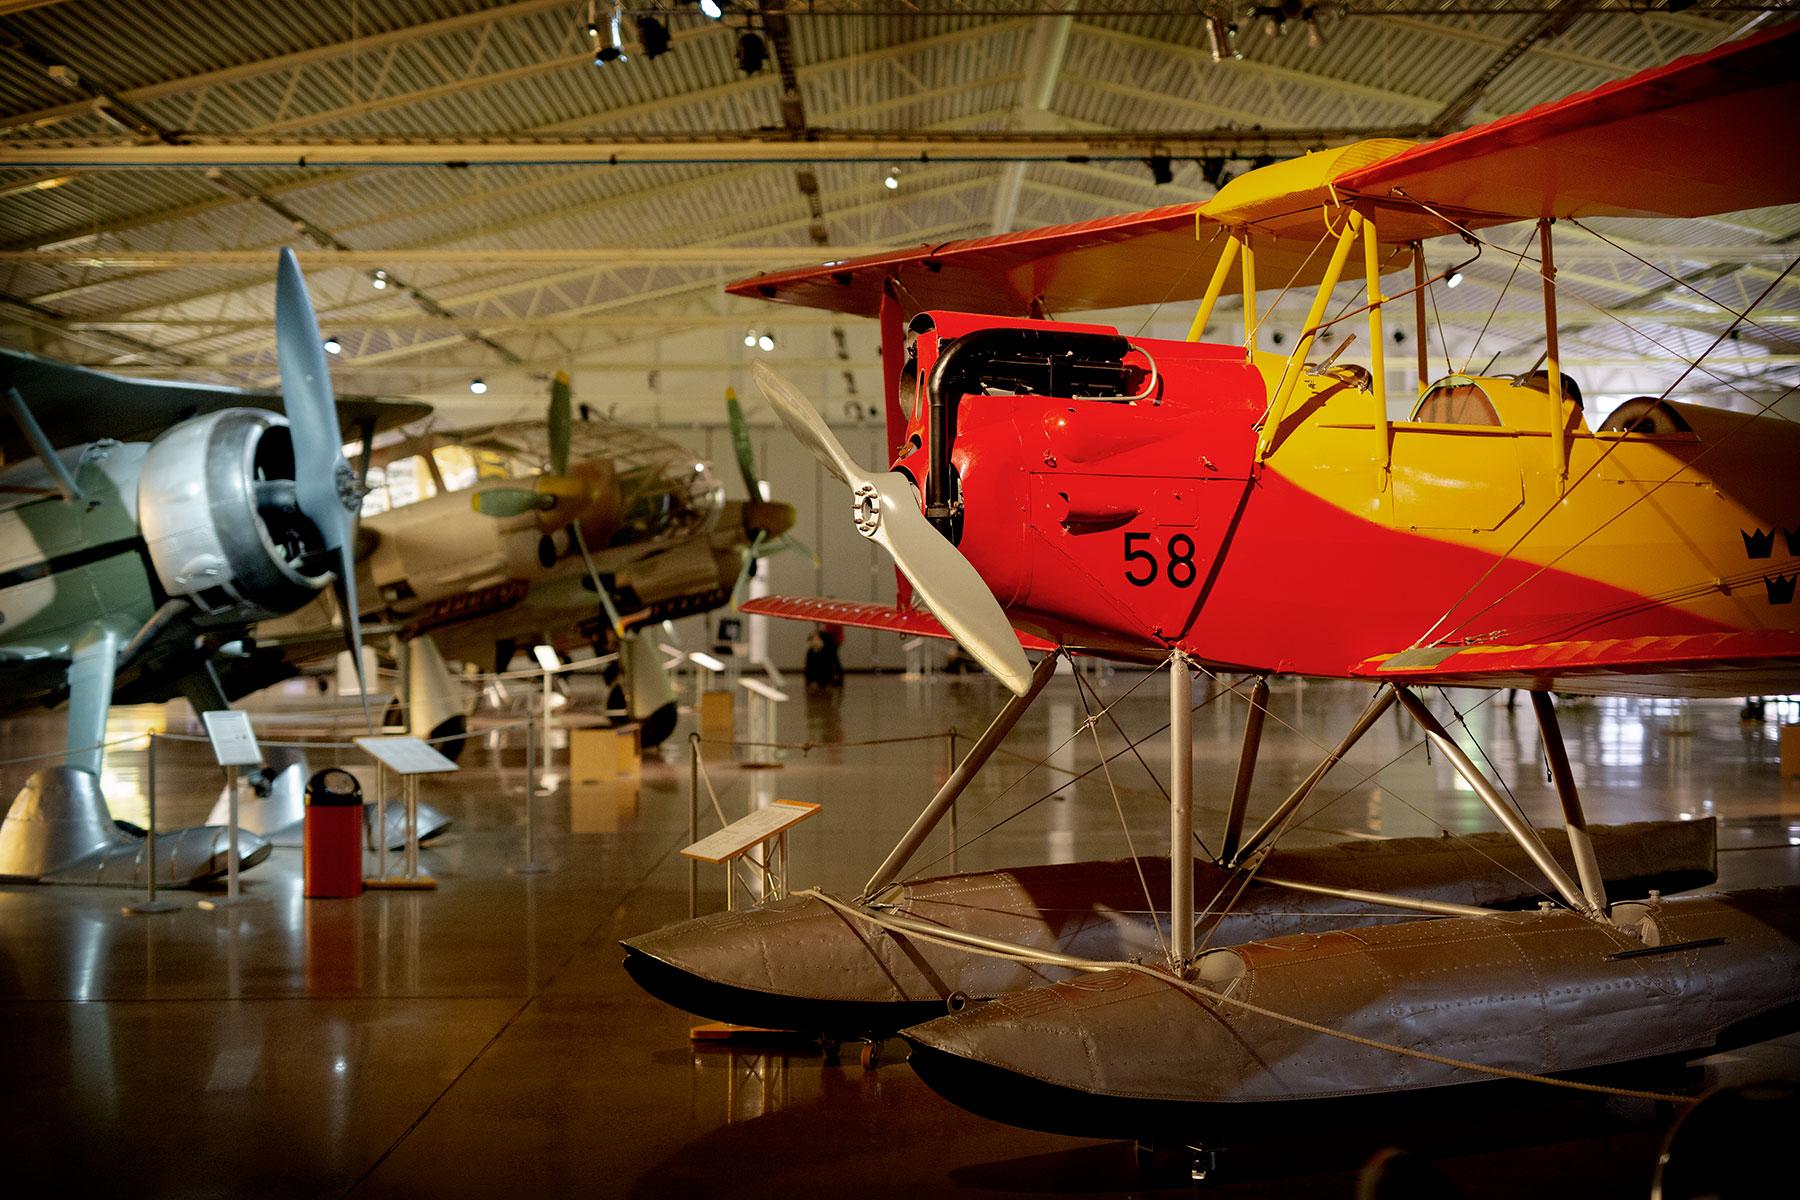 blogg-190215flygvapenmuseet6.jpg